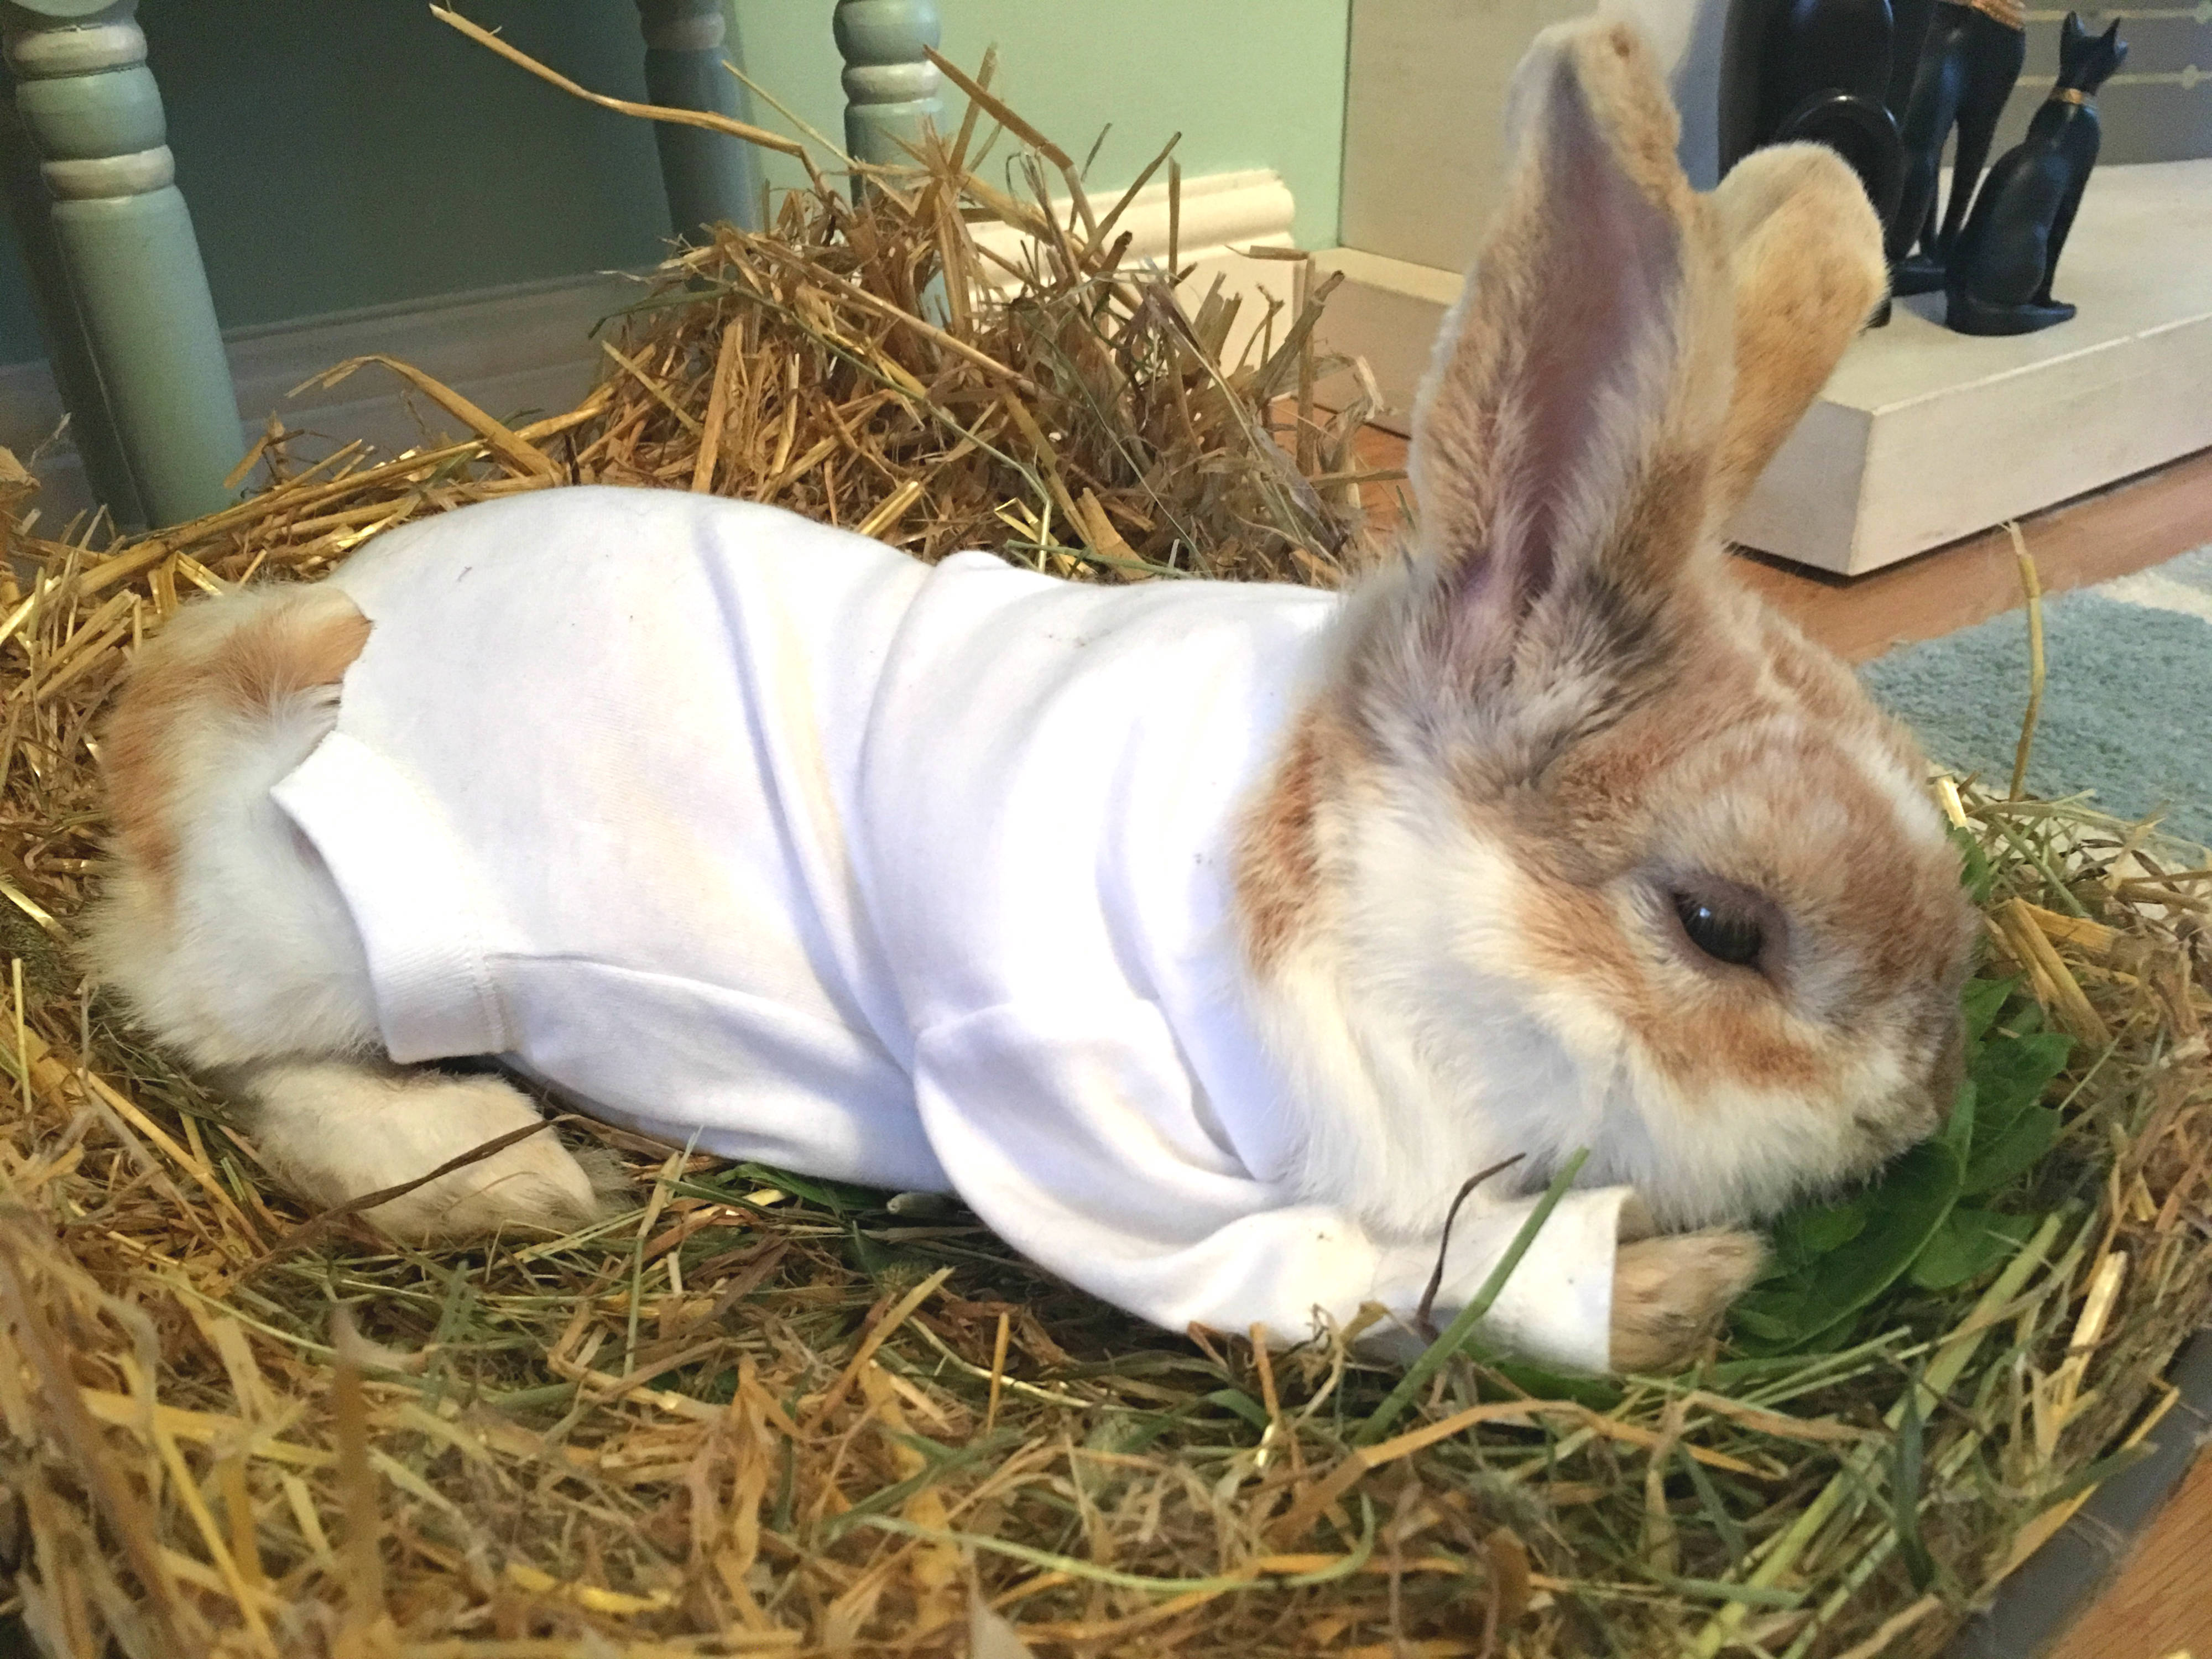 Burgess the rabbit